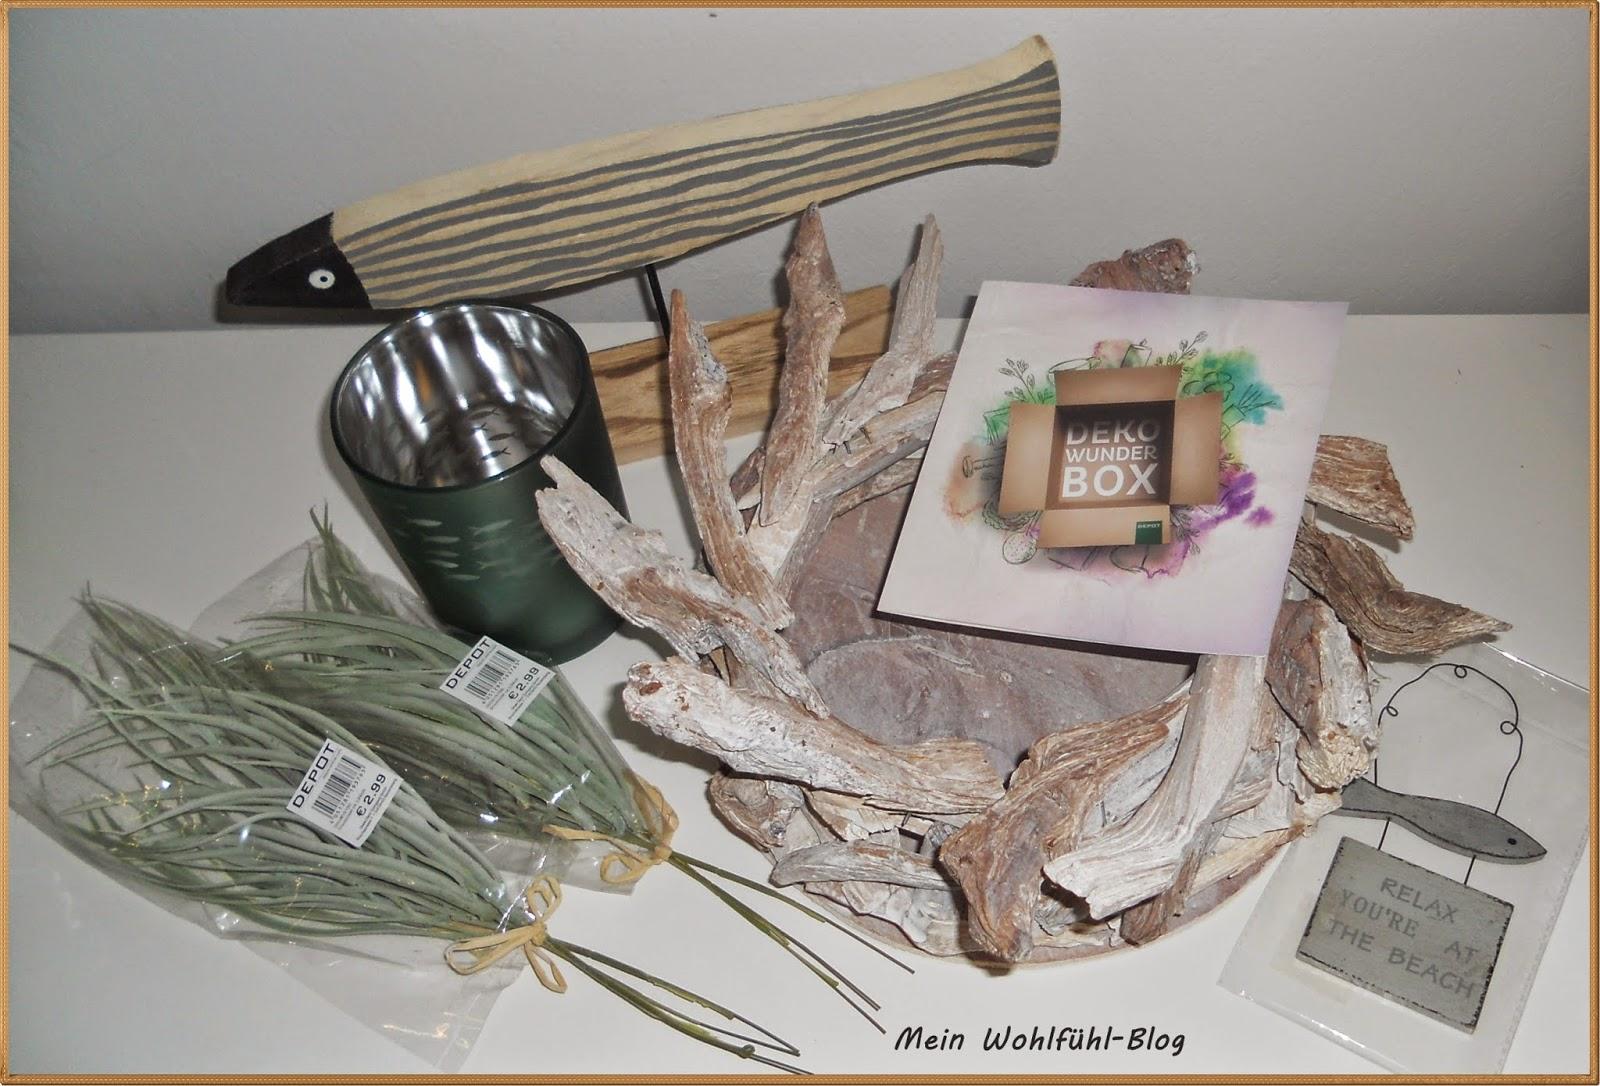 mein wohlf hl blog depot deko wunder box mai 2015 maritim. Black Bedroom Furniture Sets. Home Design Ideas